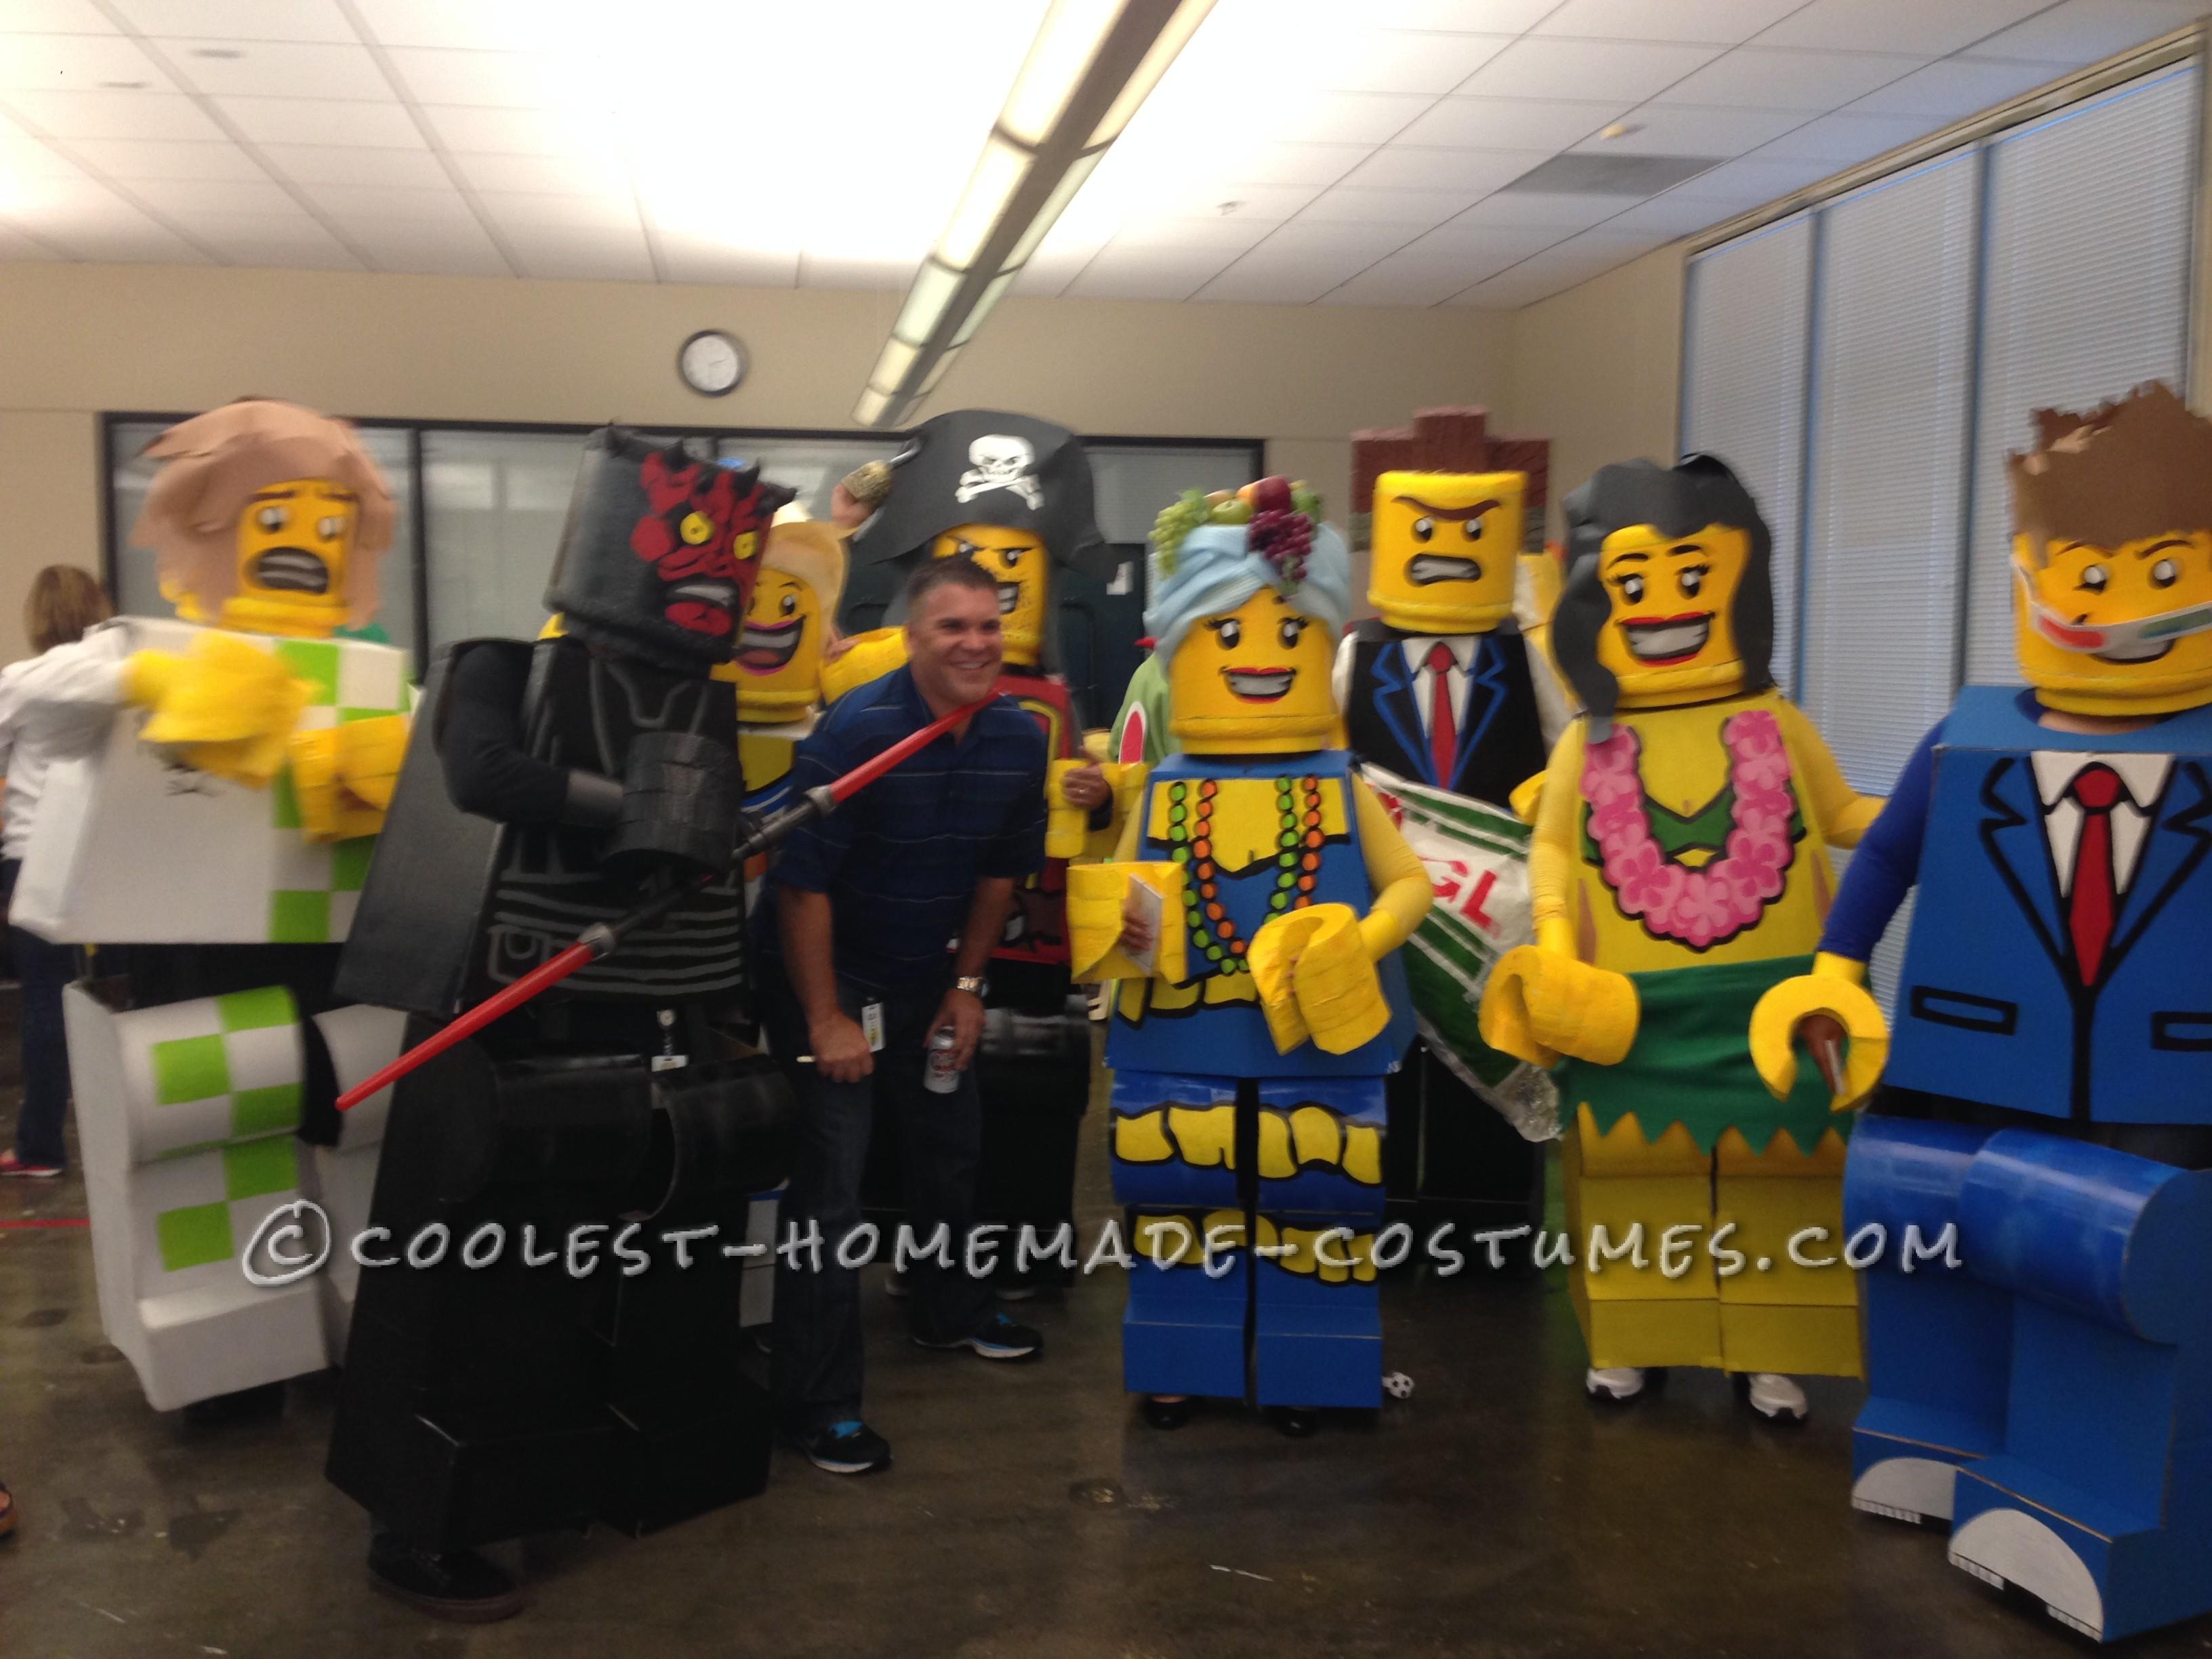 Corporate LEGO Minifigure Costumes Extravaganza